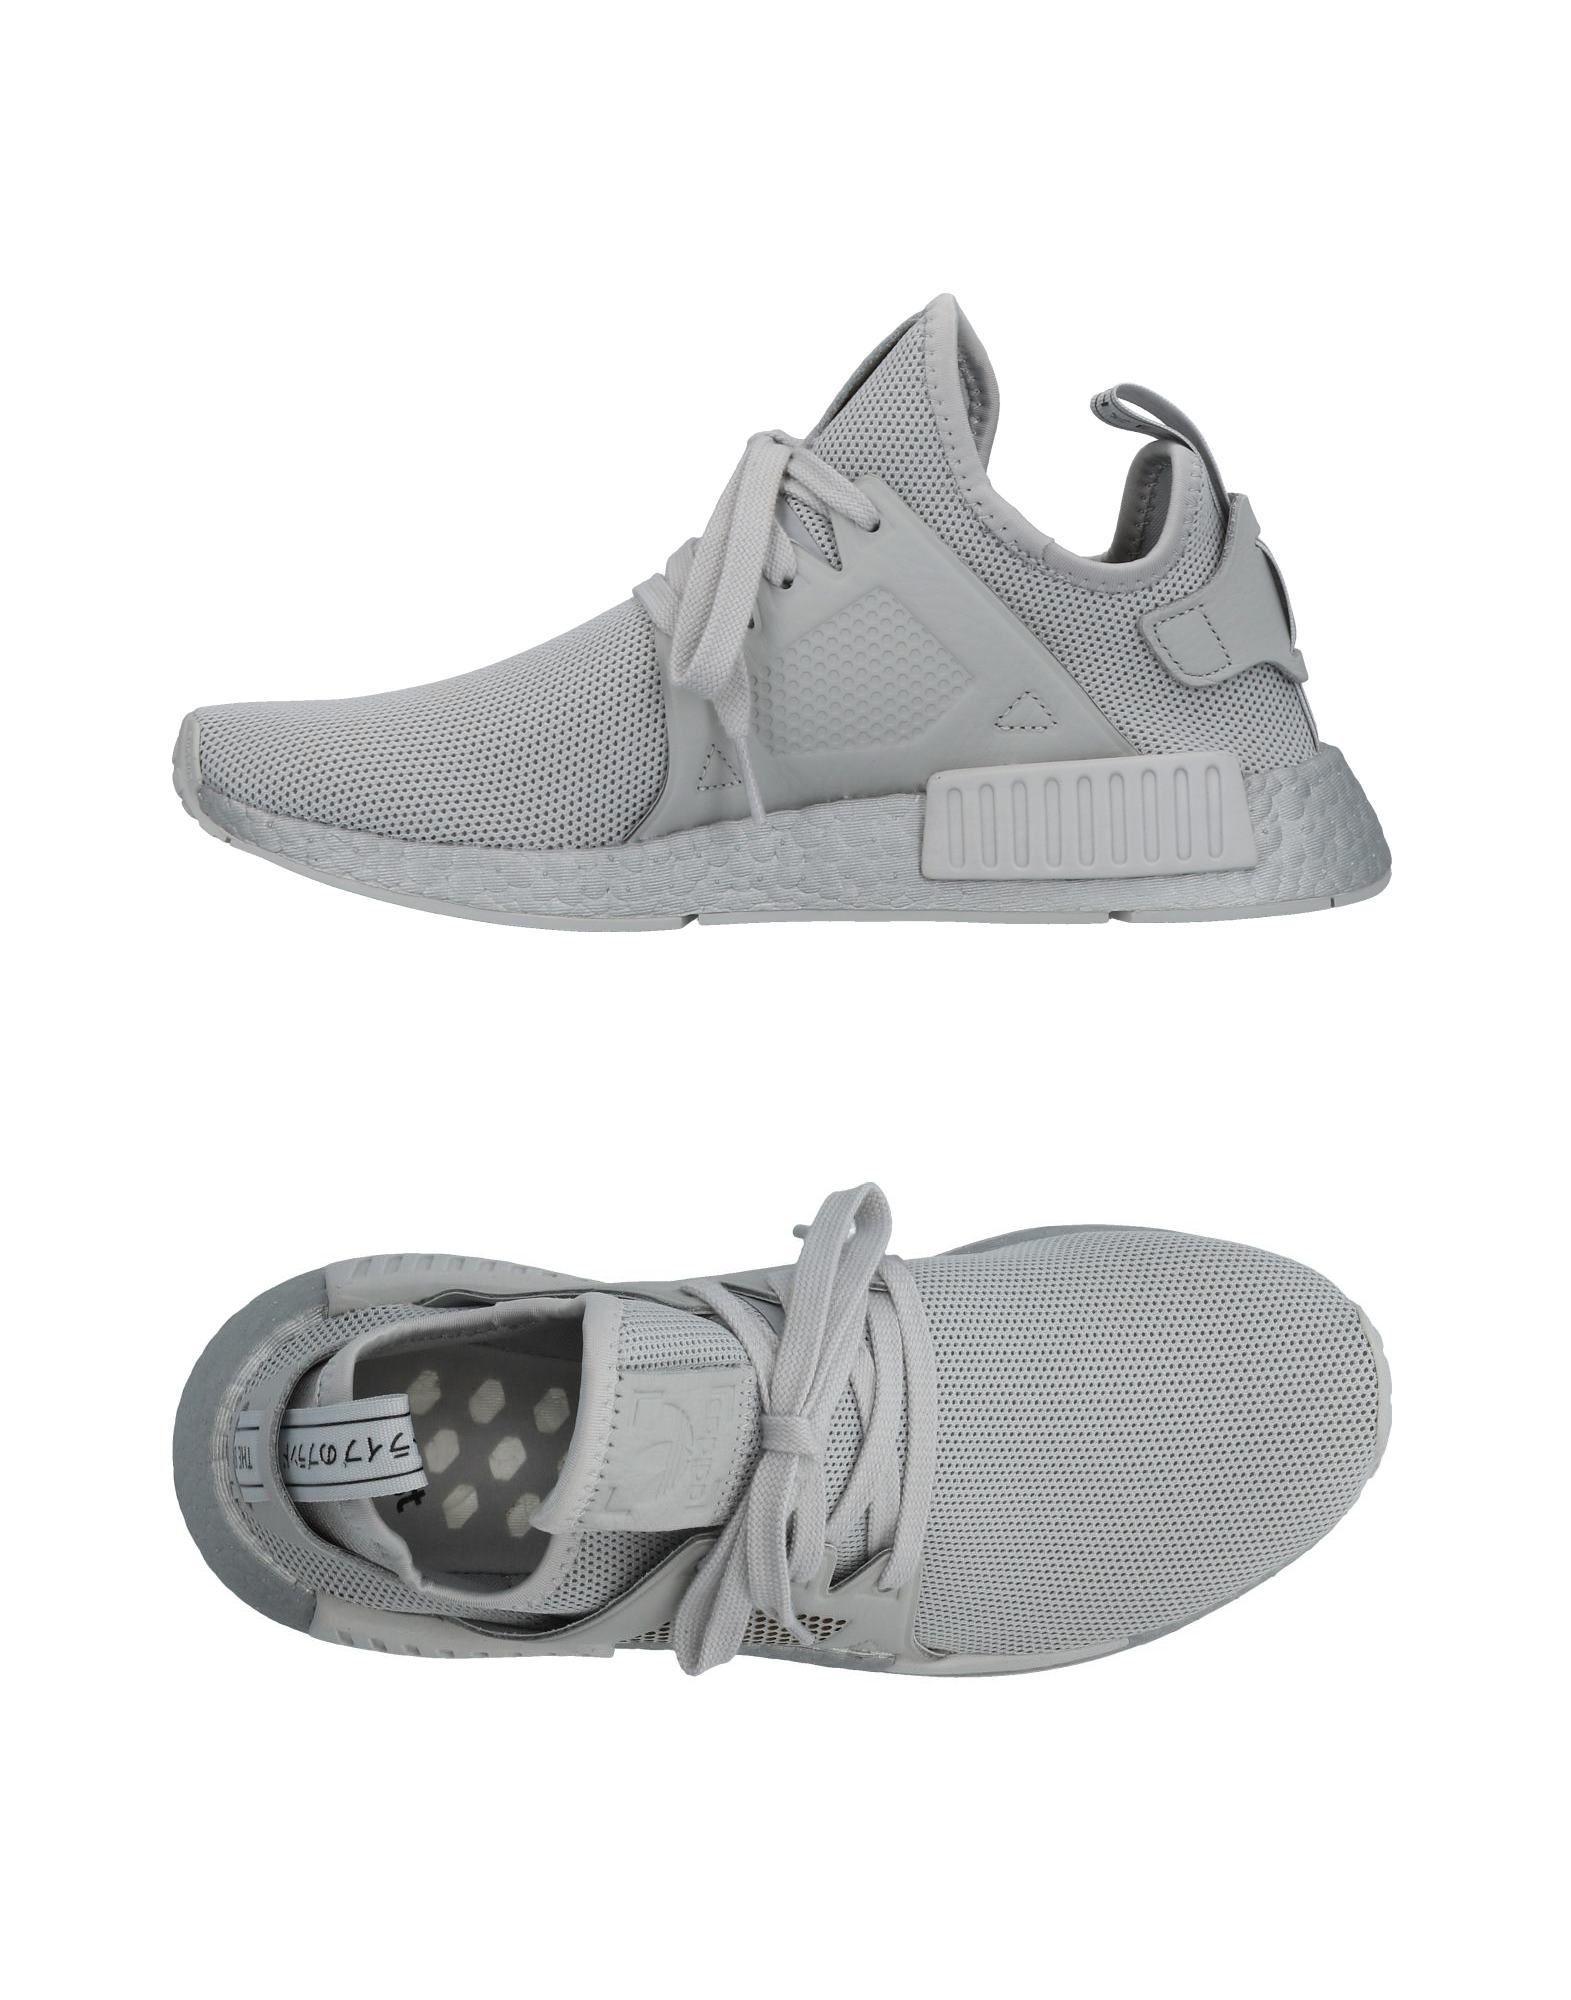 buy popular 9e335 df6dc ADIDAS ΠΑΠΟΥΤΣΙΑ Παπούτσια τένις χαμηλά, Ανδρικά παπούτσια τέννις ...